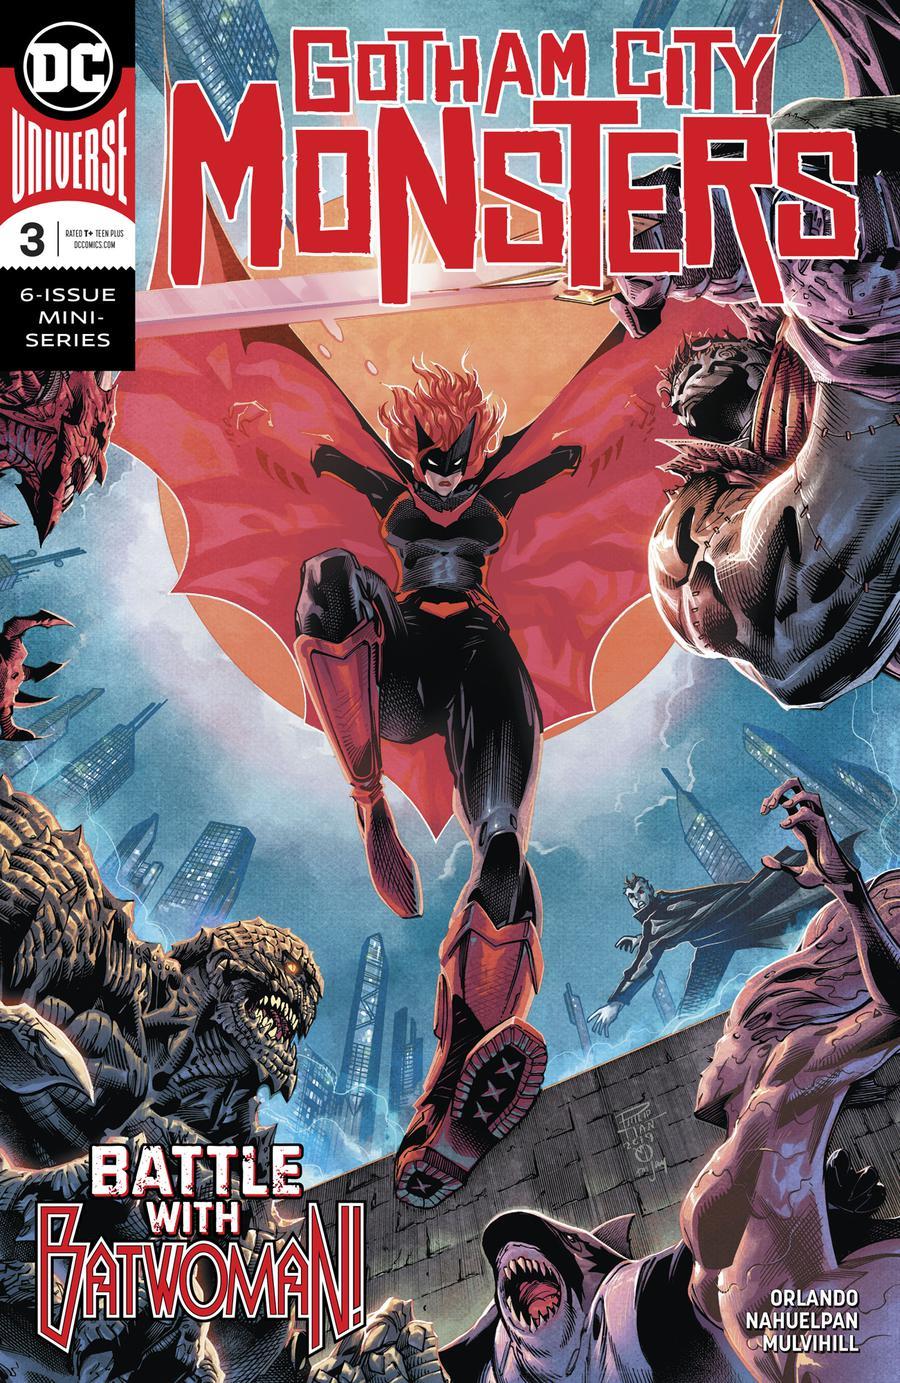 Gotham City Monsters #3